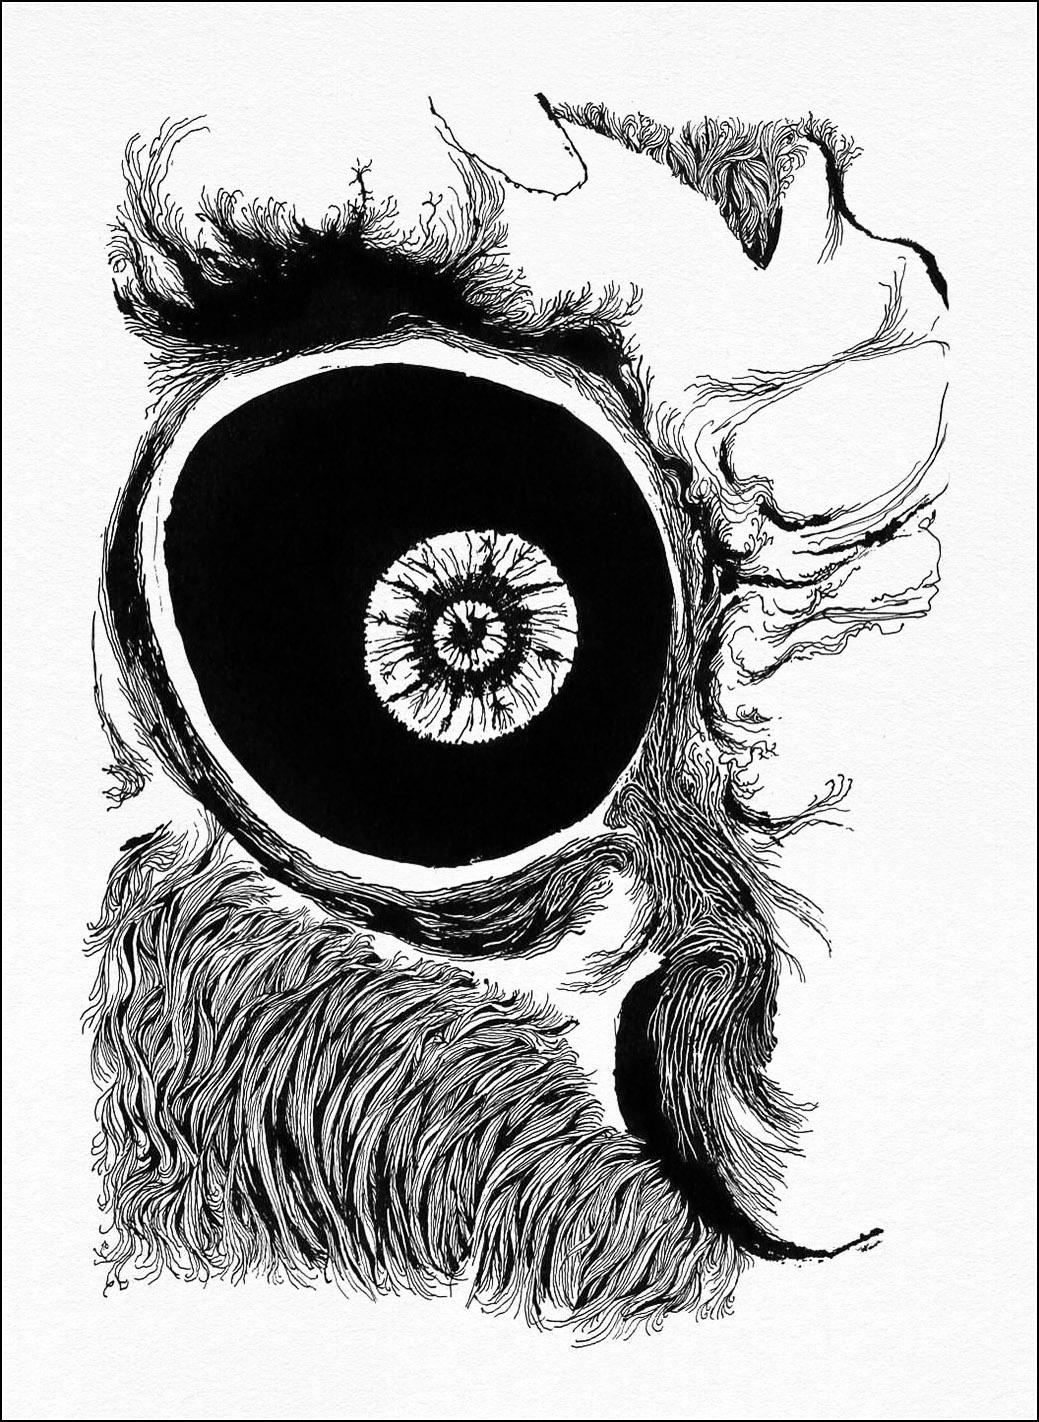 Oscar Liebman, Tales of Poe